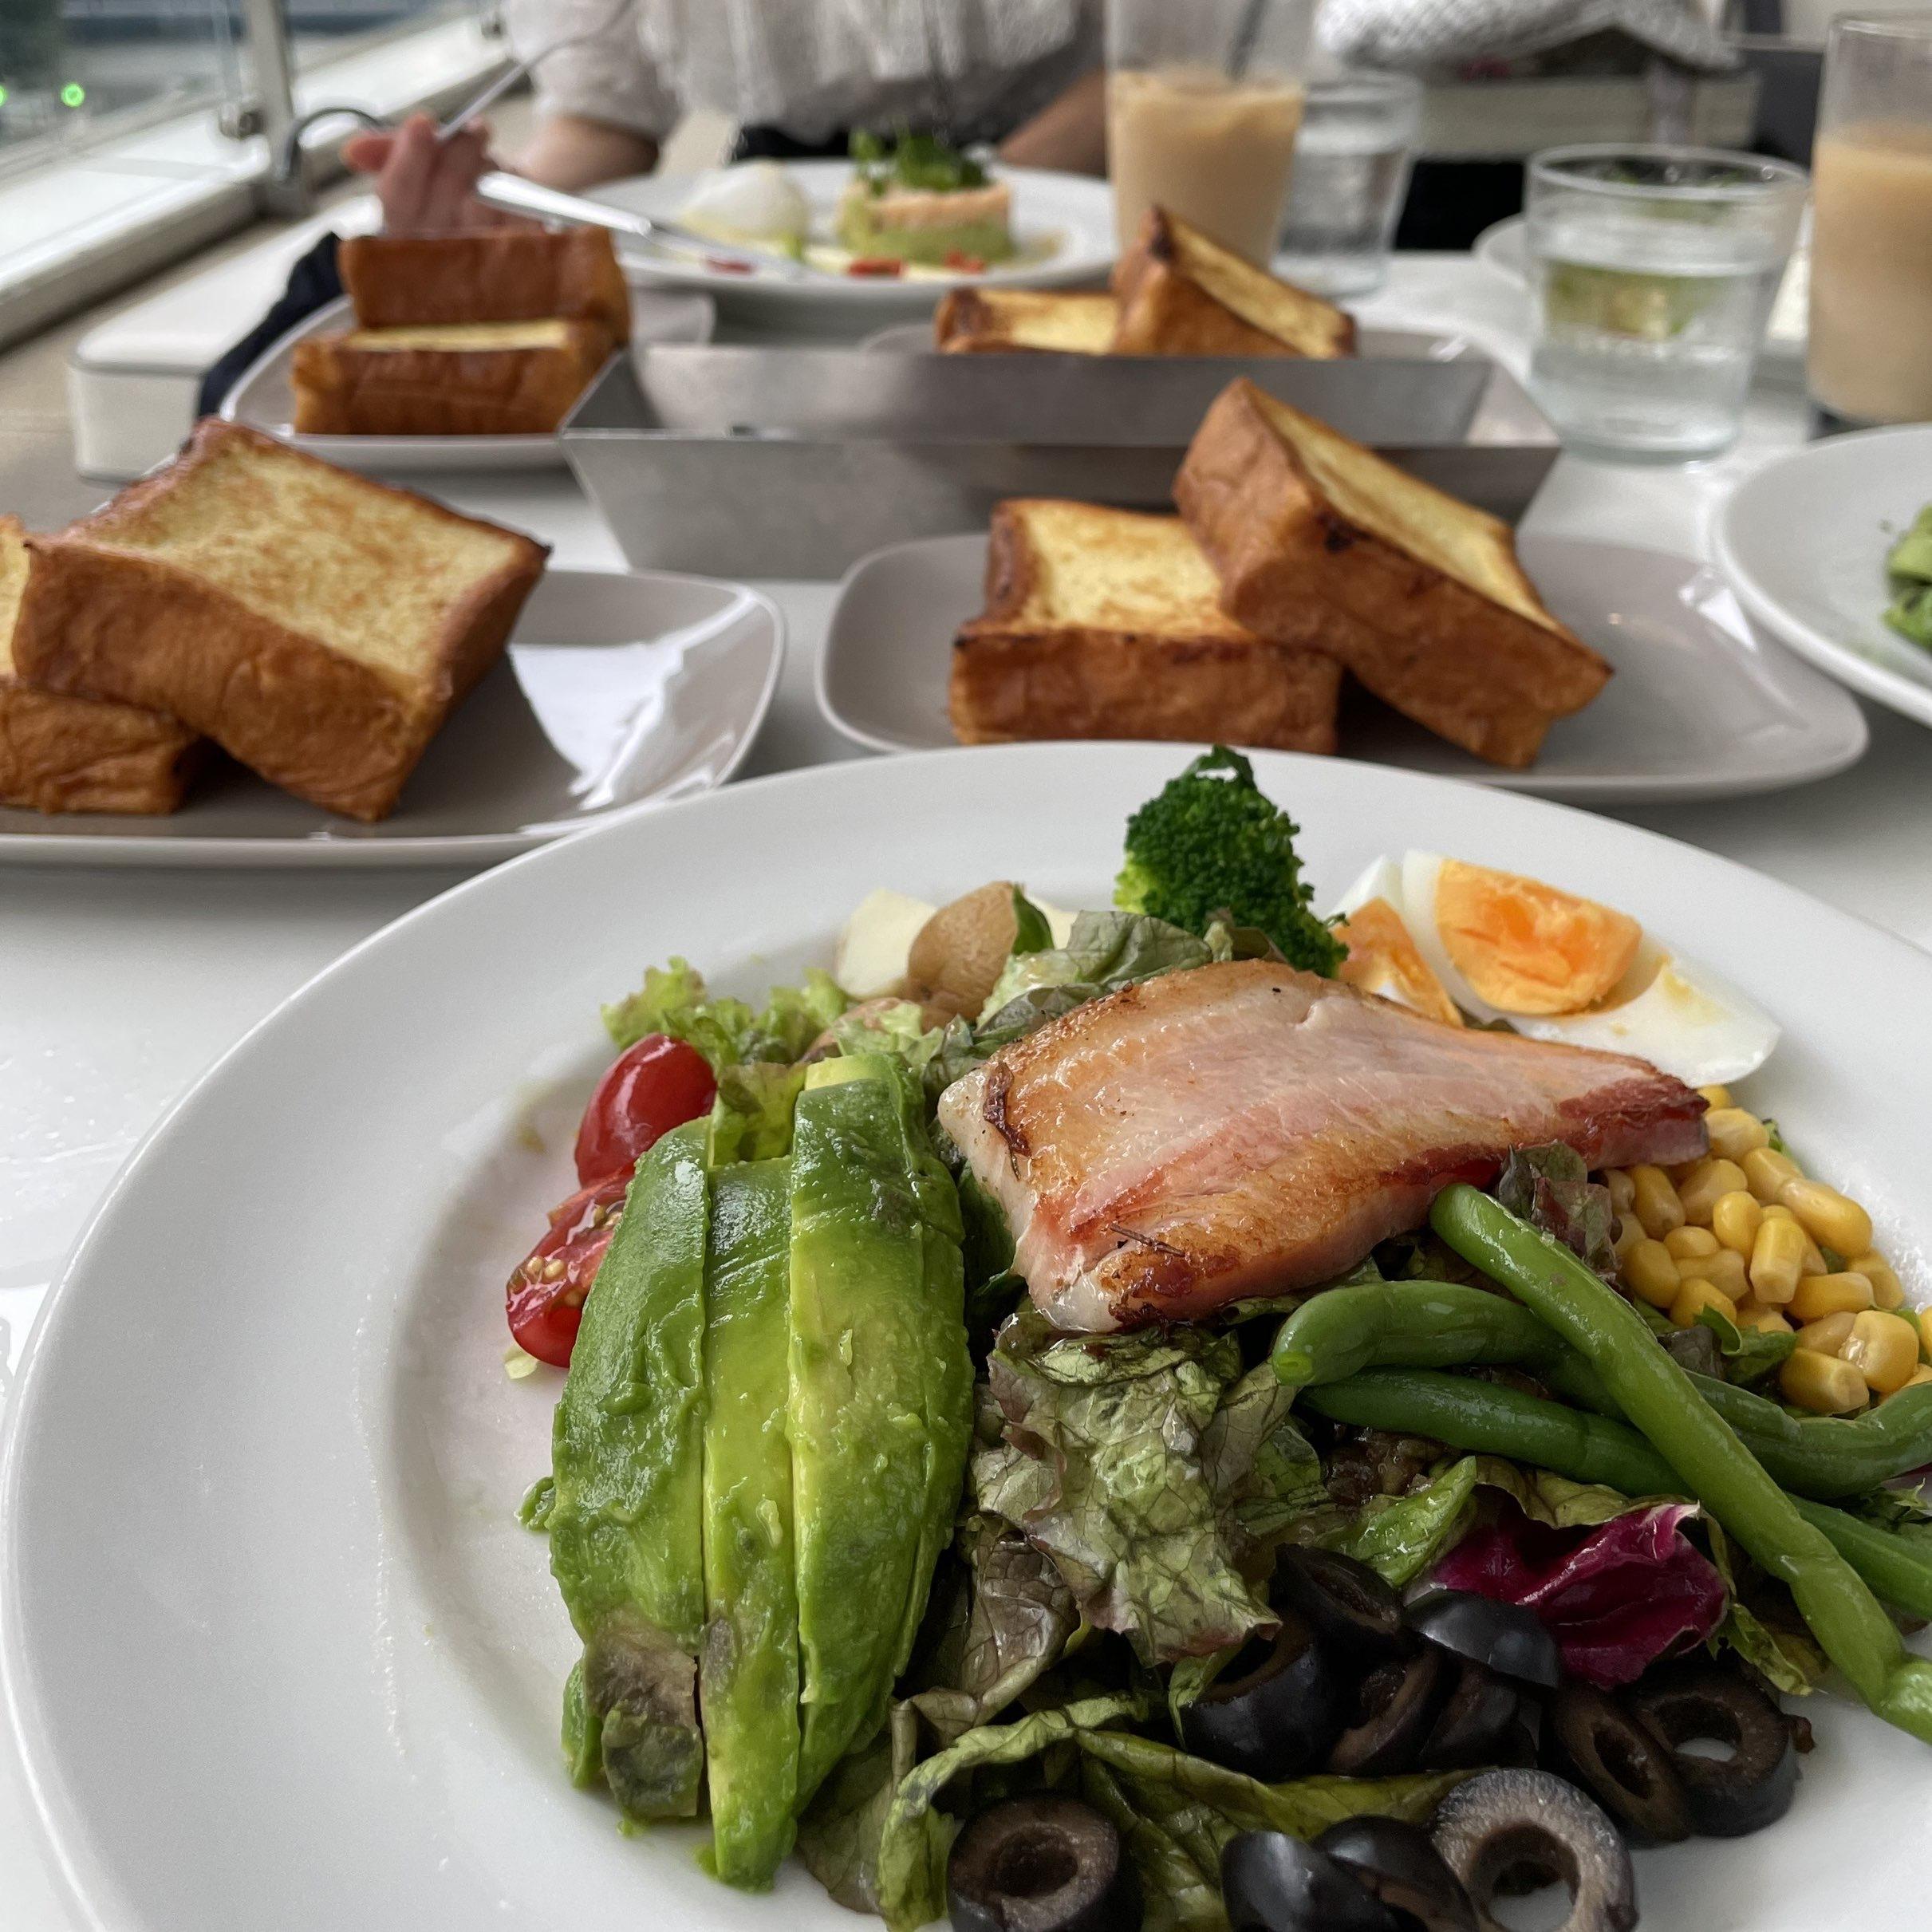 MERCER BRUNCH 銀座テラス」 ランチ、サラダ、フレンチトースト